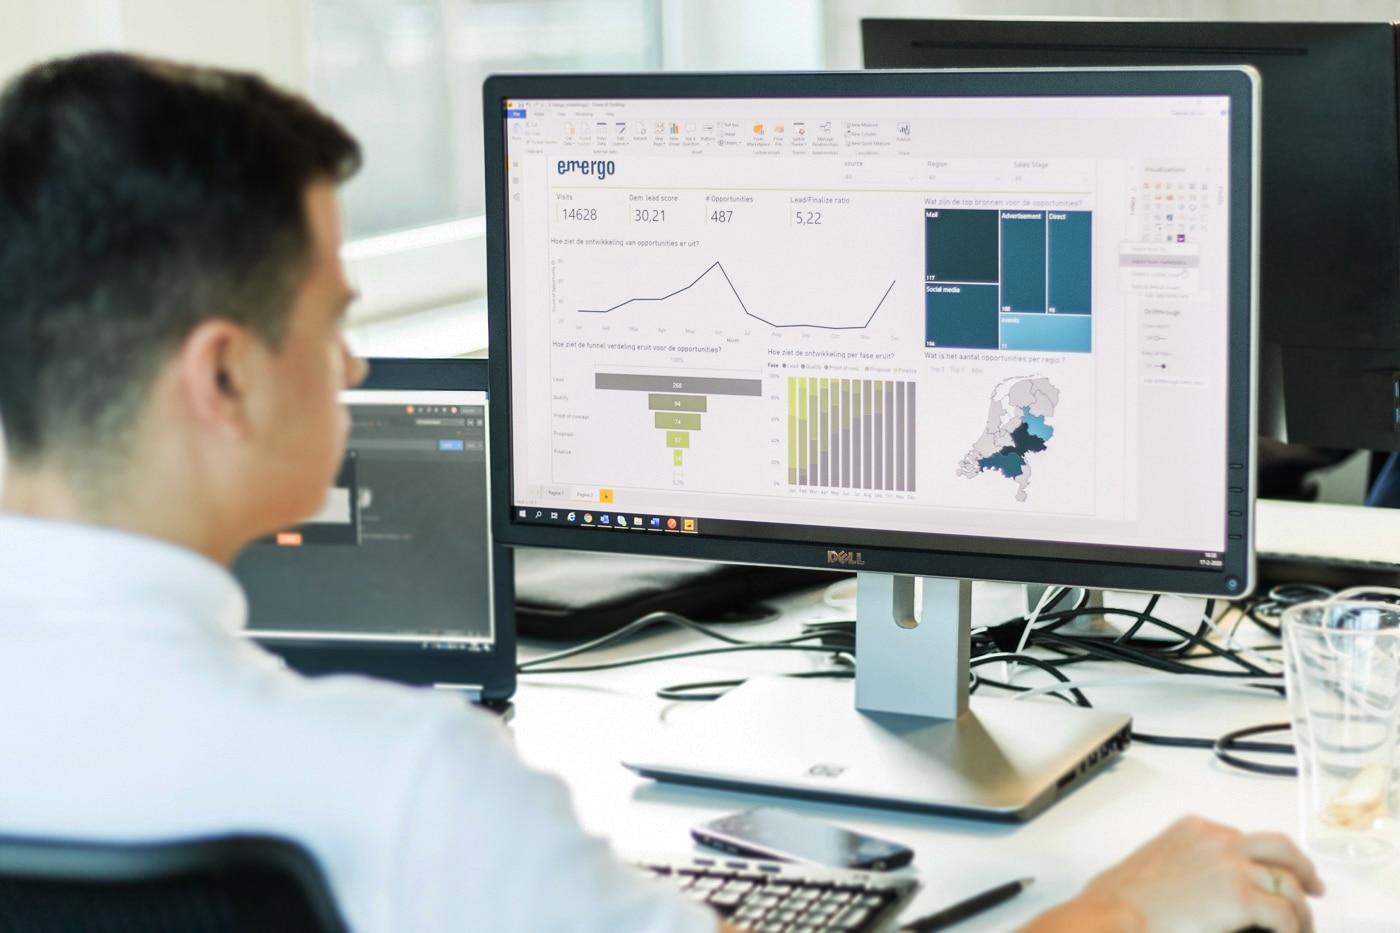 power bi, microsoft, power bi desktop, datavisualisatie, business intelligence, business analytics, analytics, powerbi, e-mergo.nl